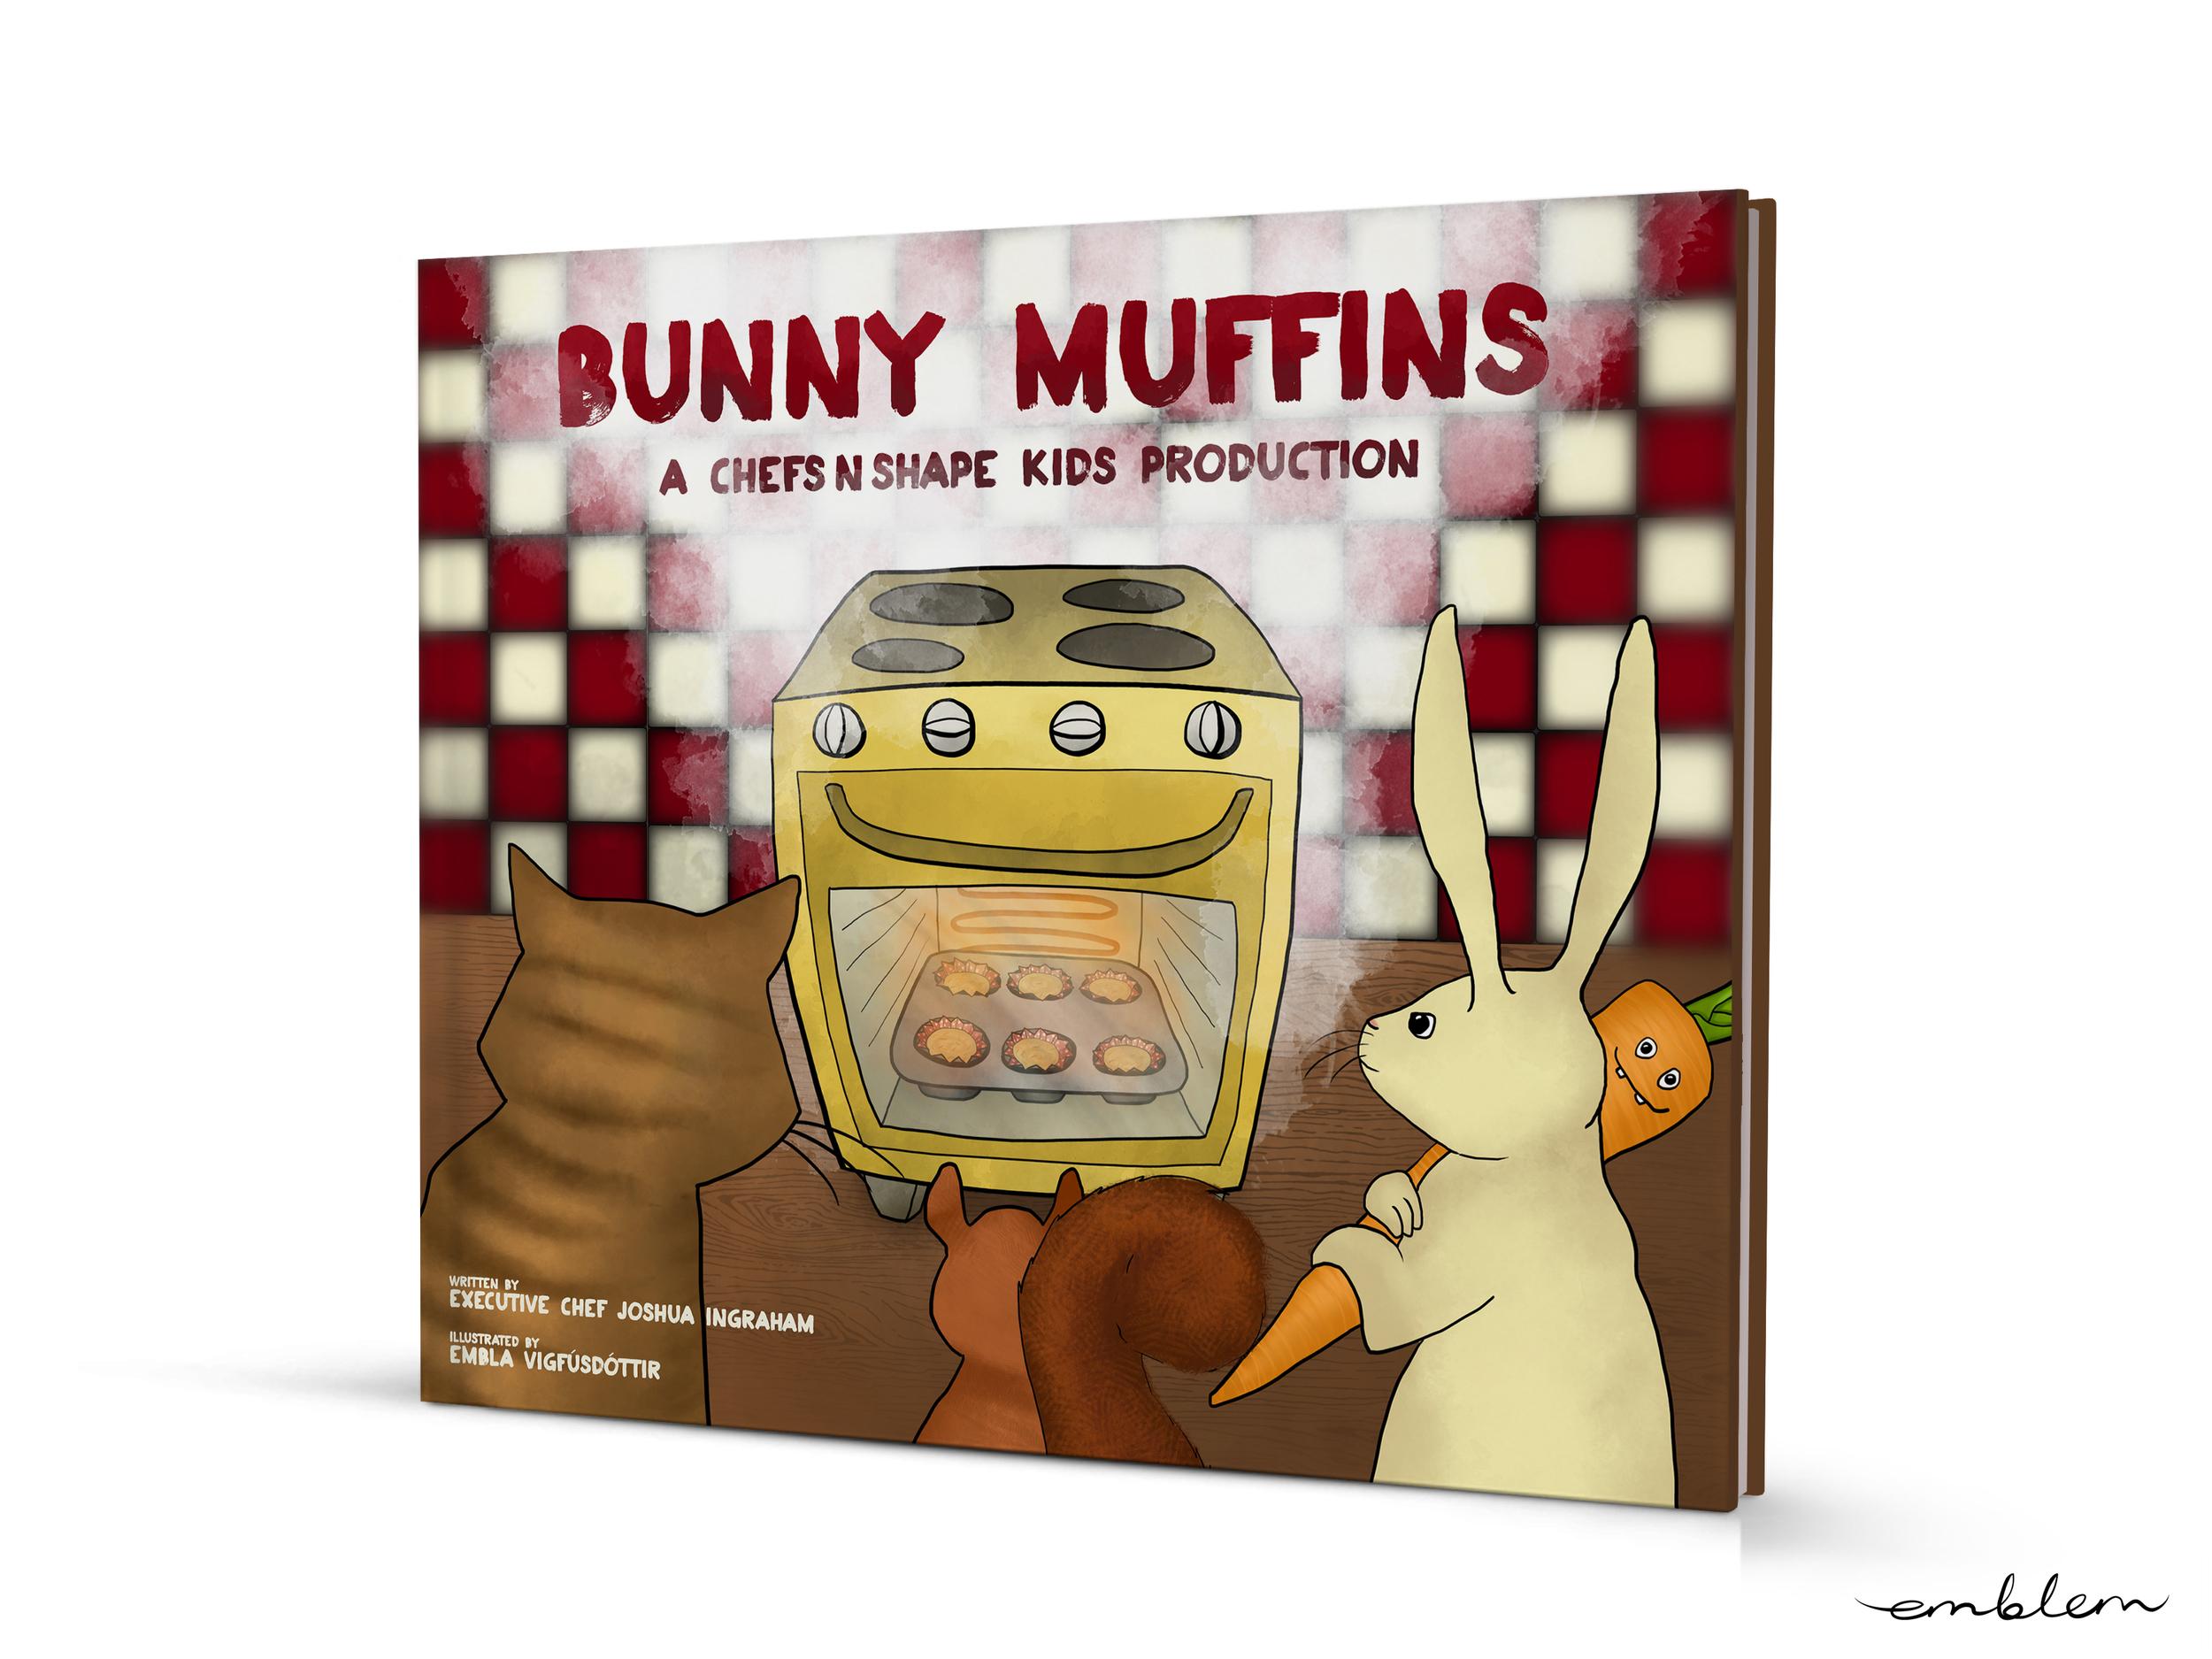 BunnyMuffins_book2.jpg